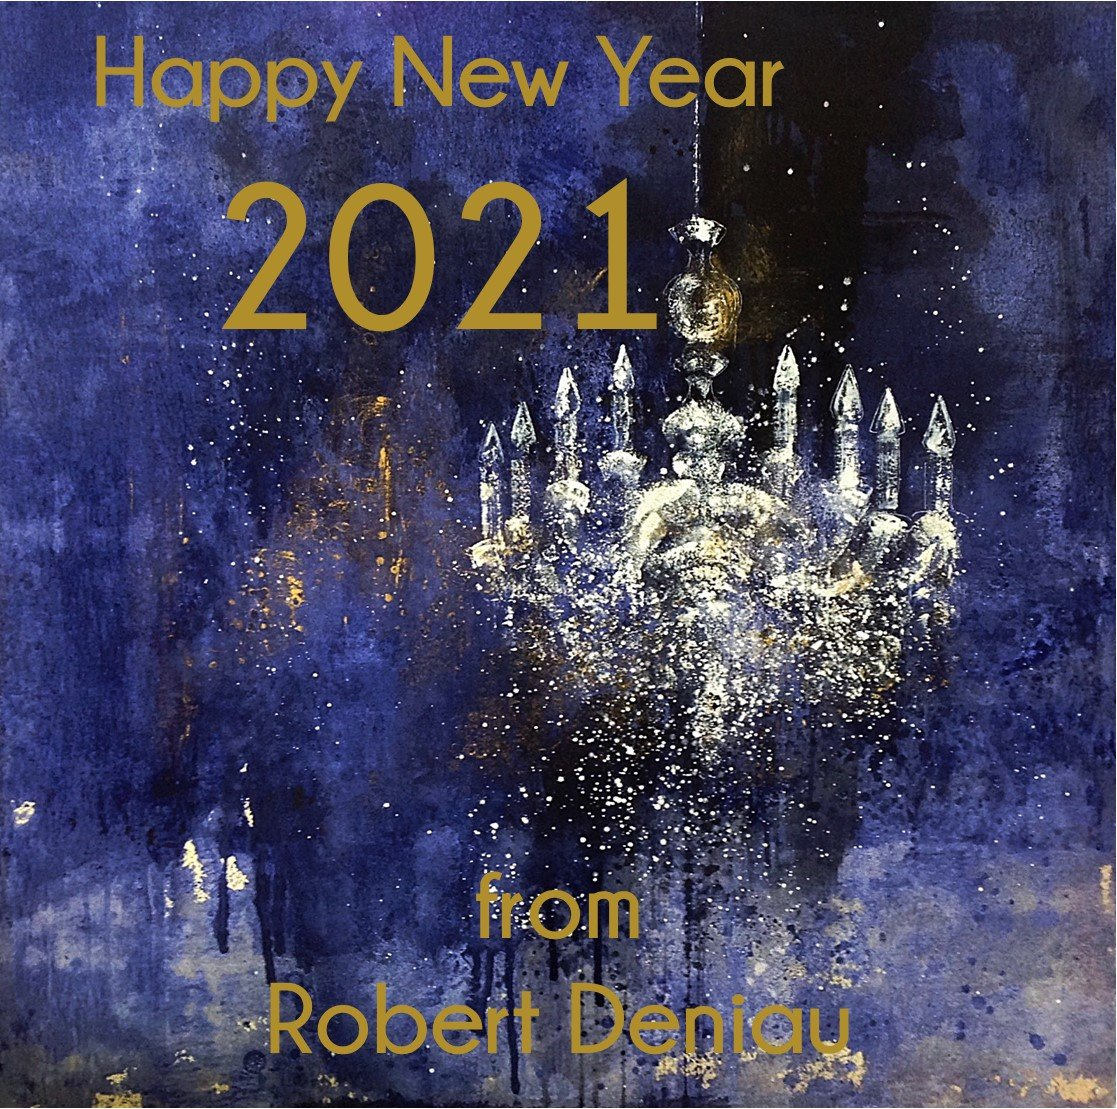 https://0501.nccdn.net/4_2/000/000/071/260/happy-new-year-2021-art-gallery-robert-deniau-mougins.jpg